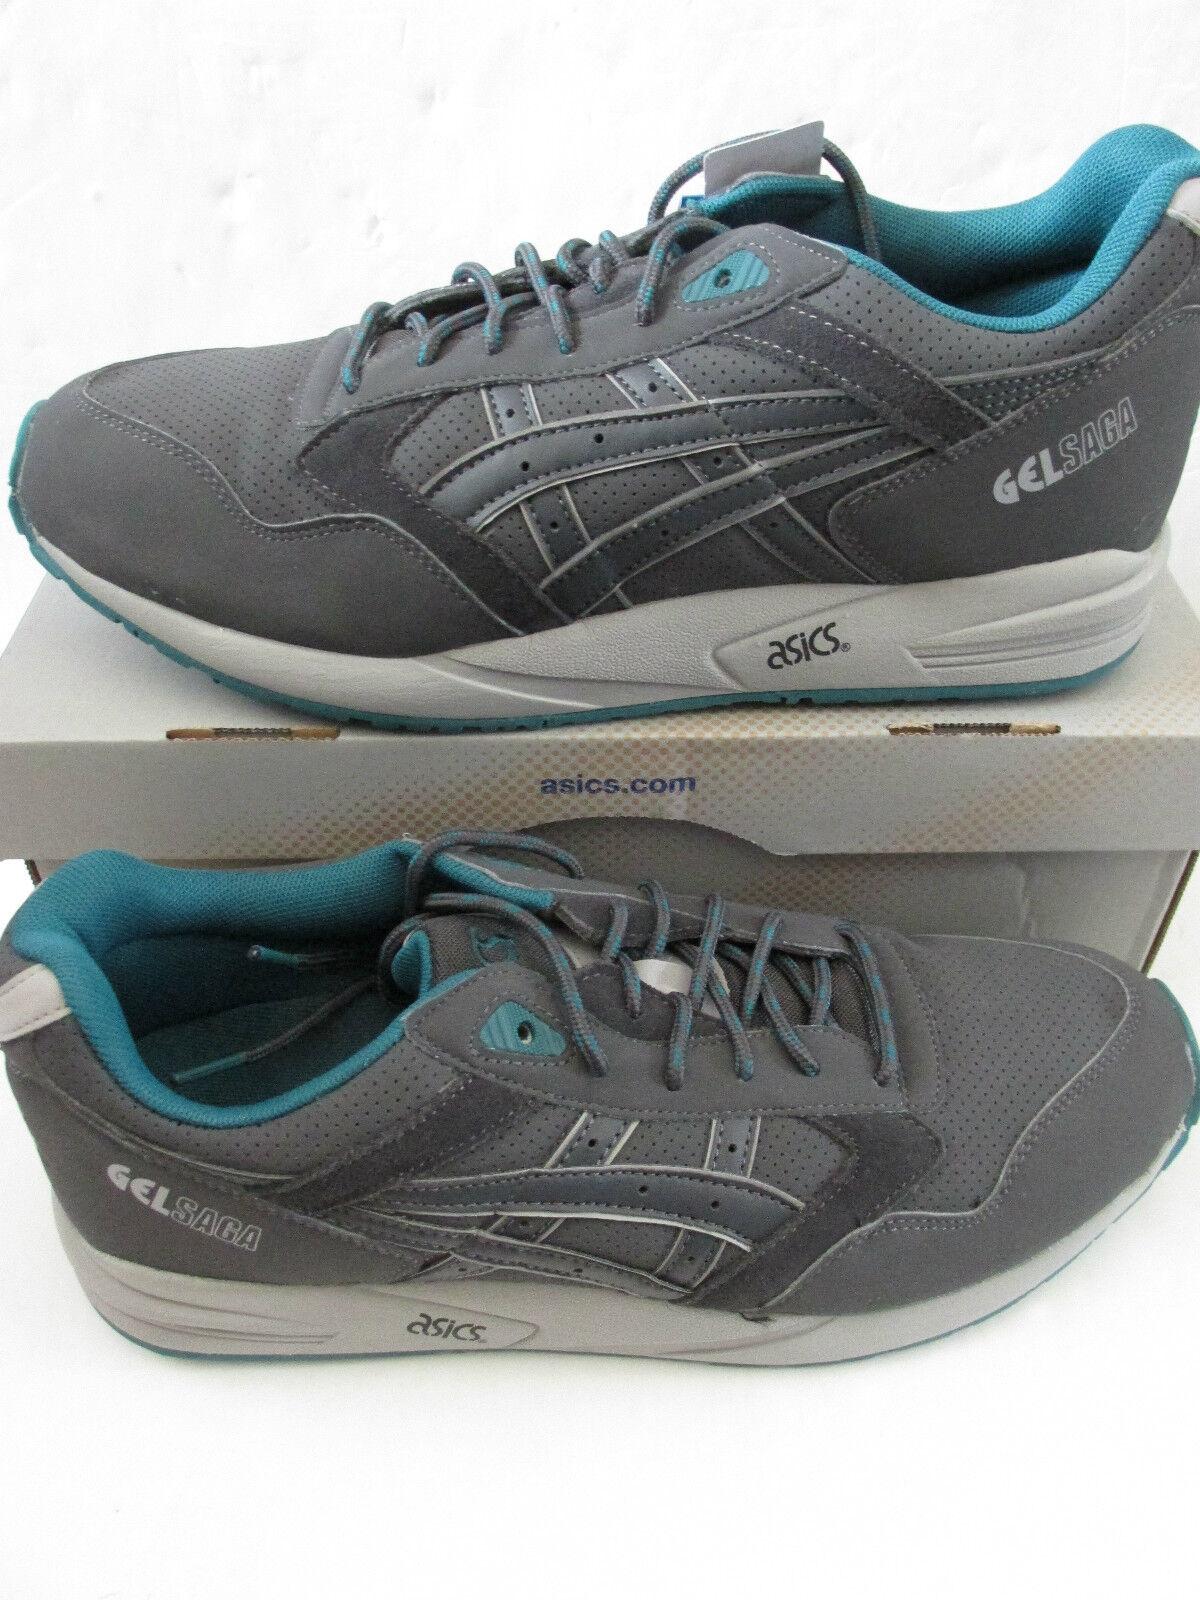 ASICS GEL Saga Sneaker Uomo h4a3y 1616 Scarpe Da Ginnastica Scarpe